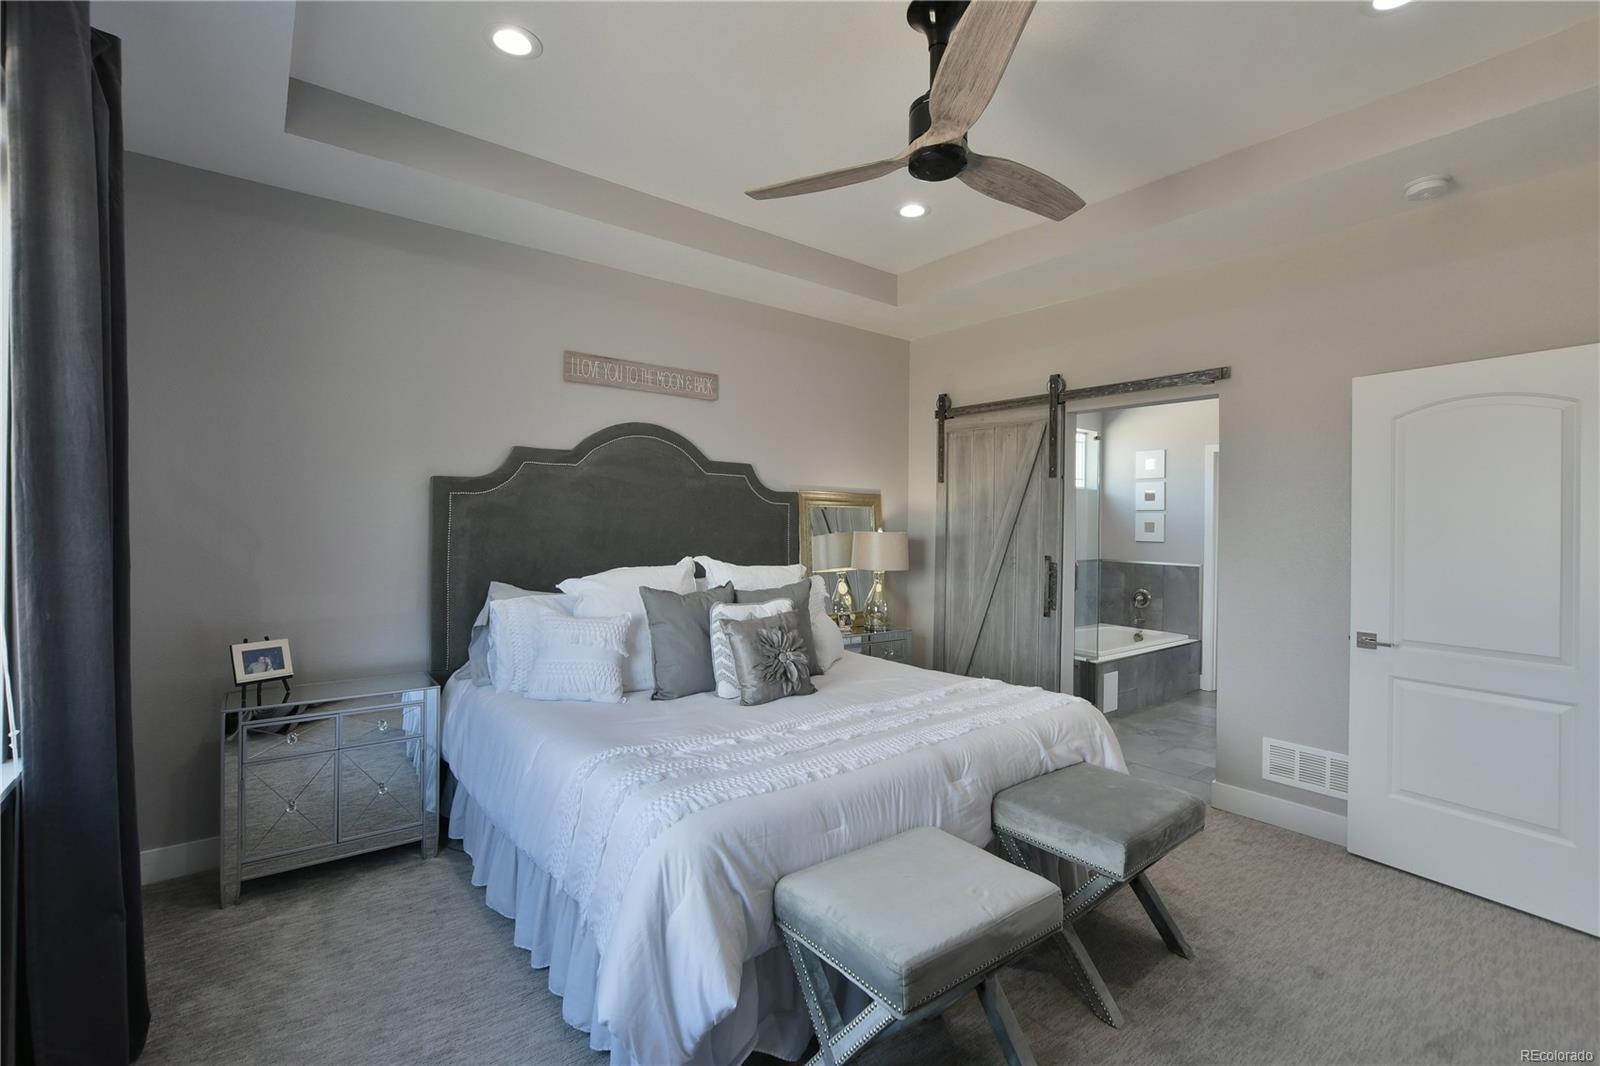 Master bedroom with coffered ceiling, recessed lighting, barn door to bathroom